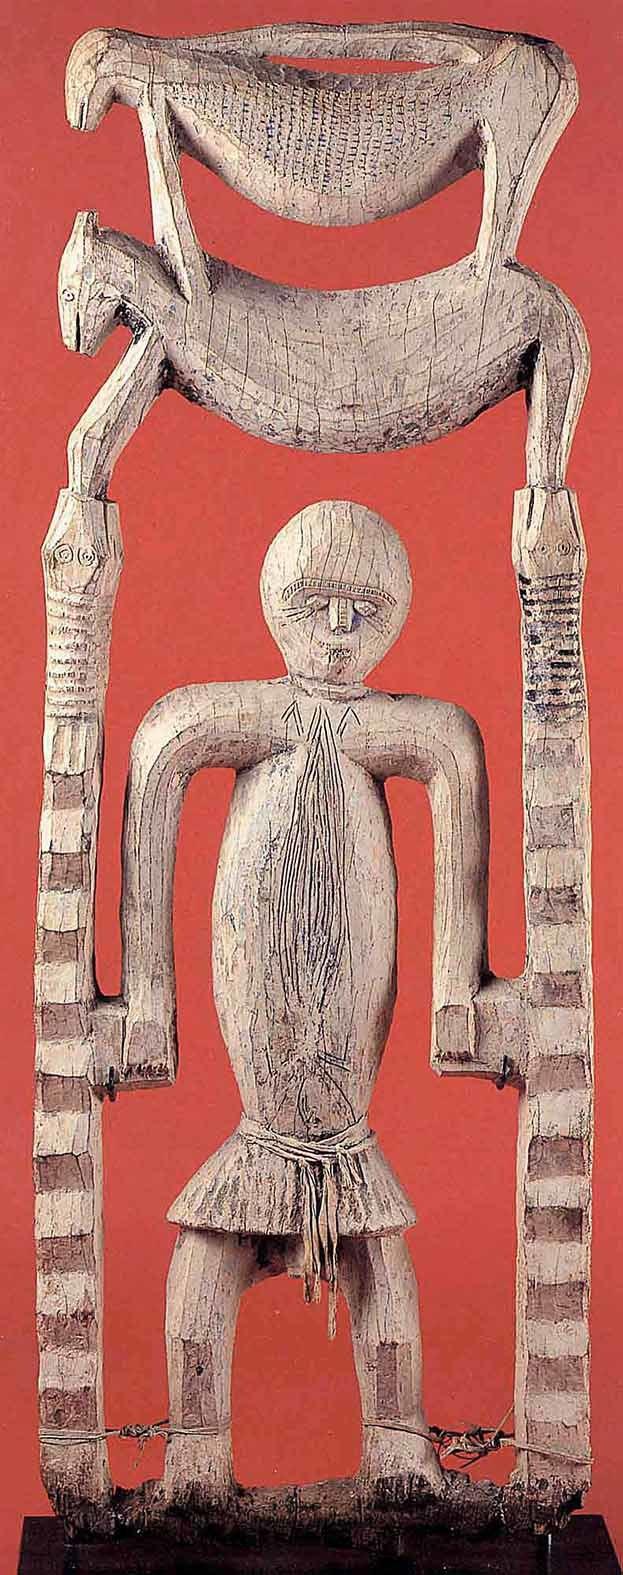 Seltene figurale Skuptur